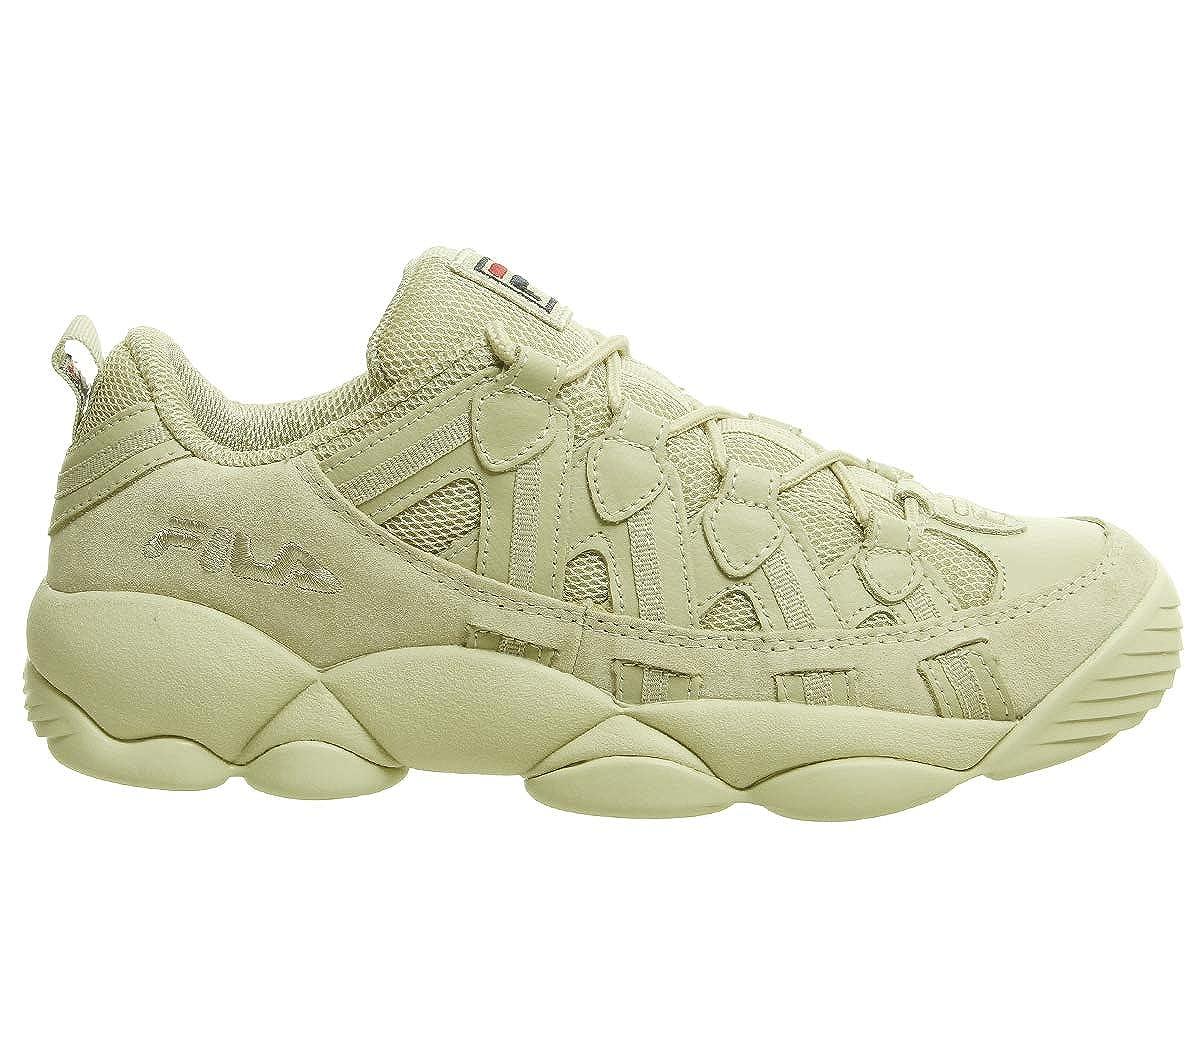 0de2936ab60d Amazon.com  Fila Spaghetti Low Cream Sneakers-UK 10  Shoes